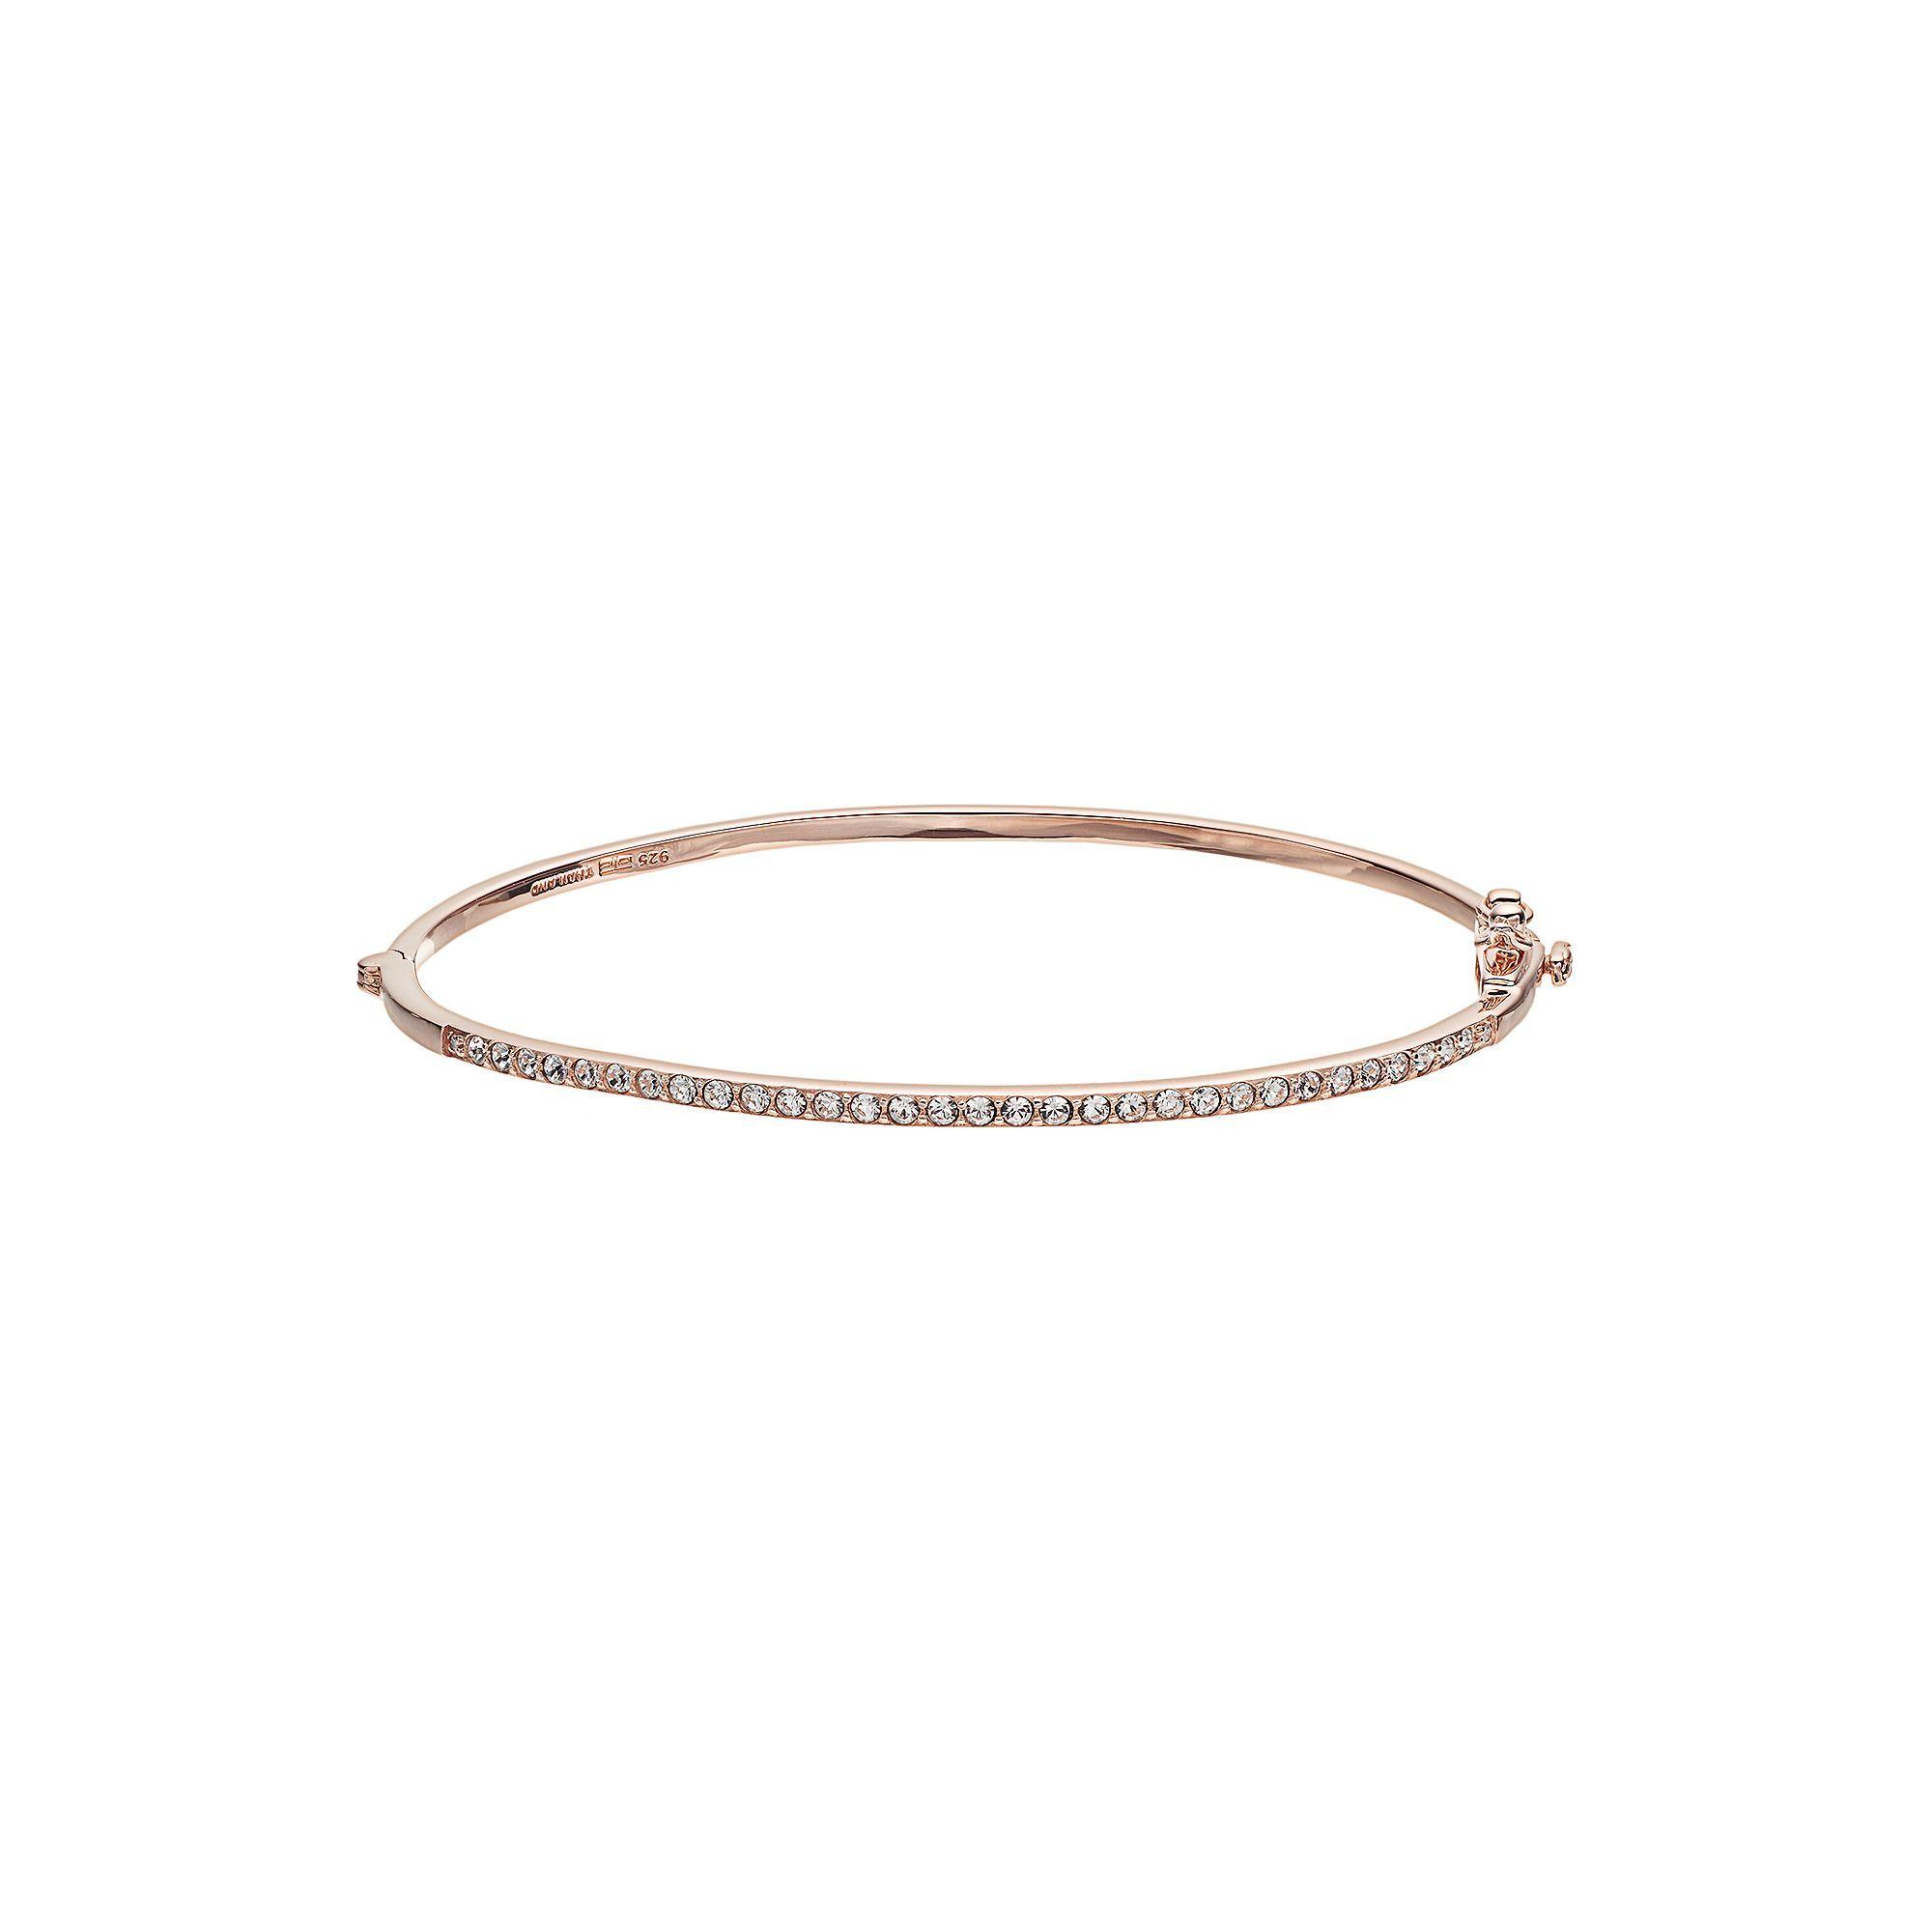 Diamond essence rose gold tone over silver bangle bracelet made